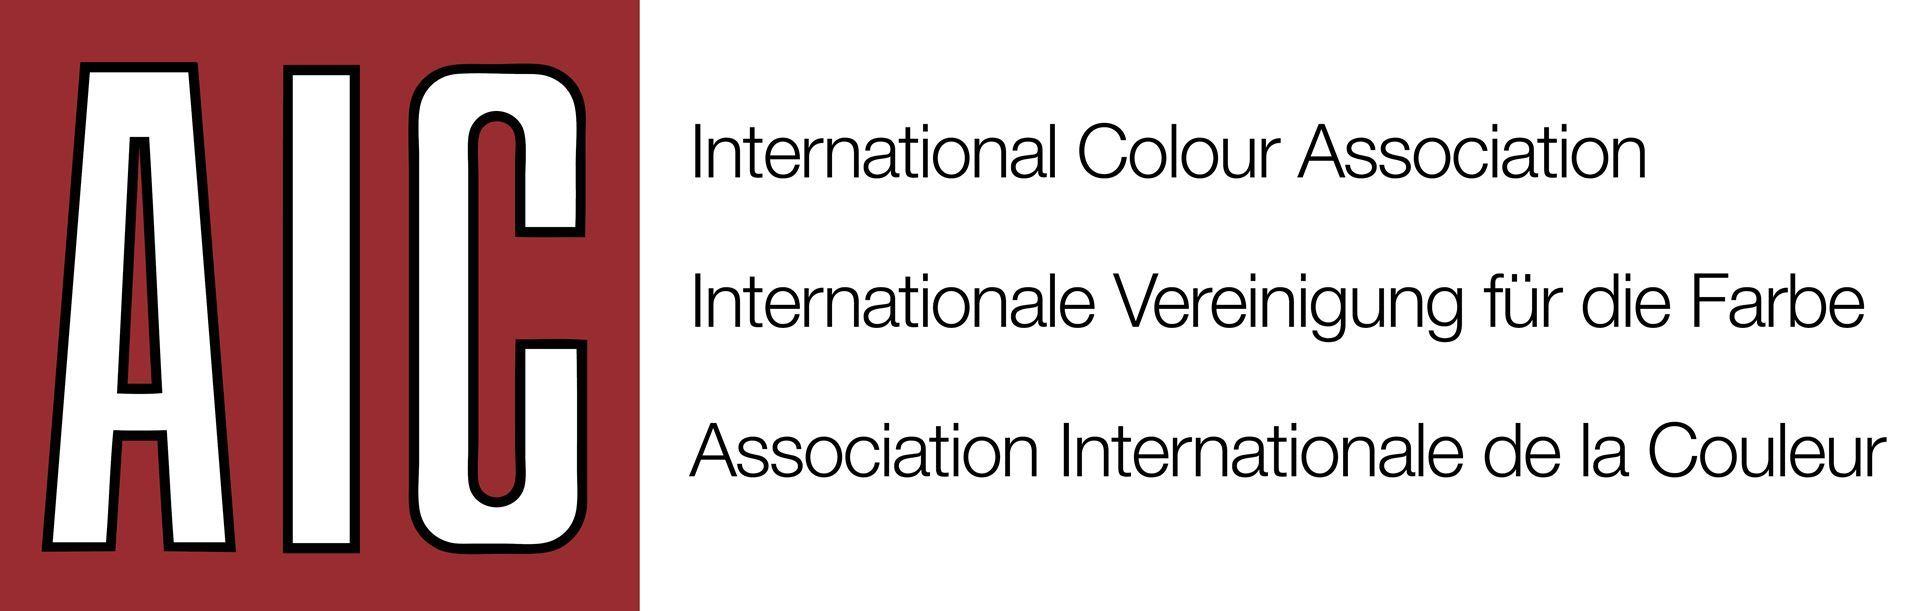 aic international colour association